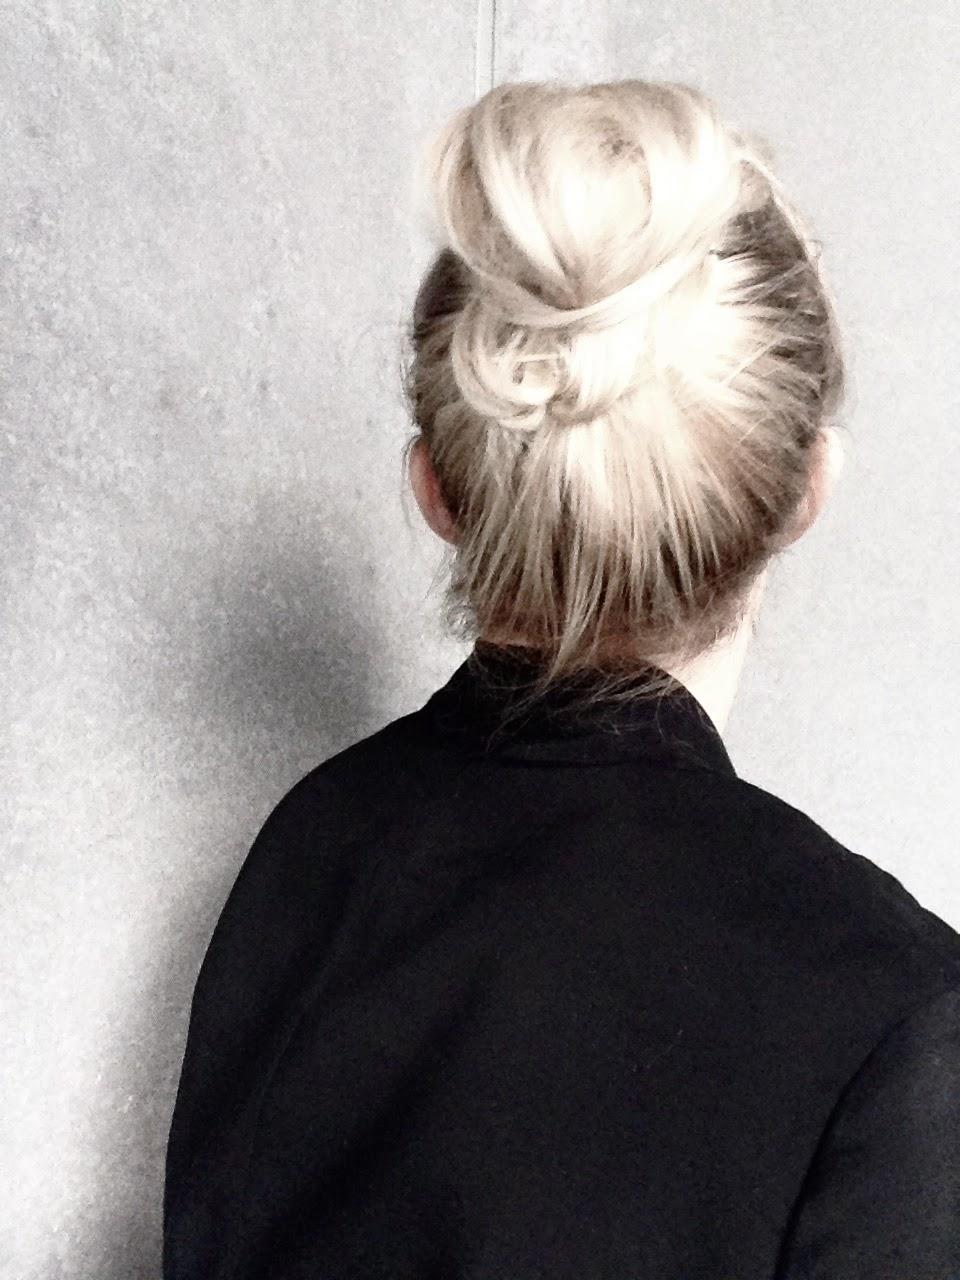 Frisyr, Knotted hair, Kampaus, Nuttura, Knåka,